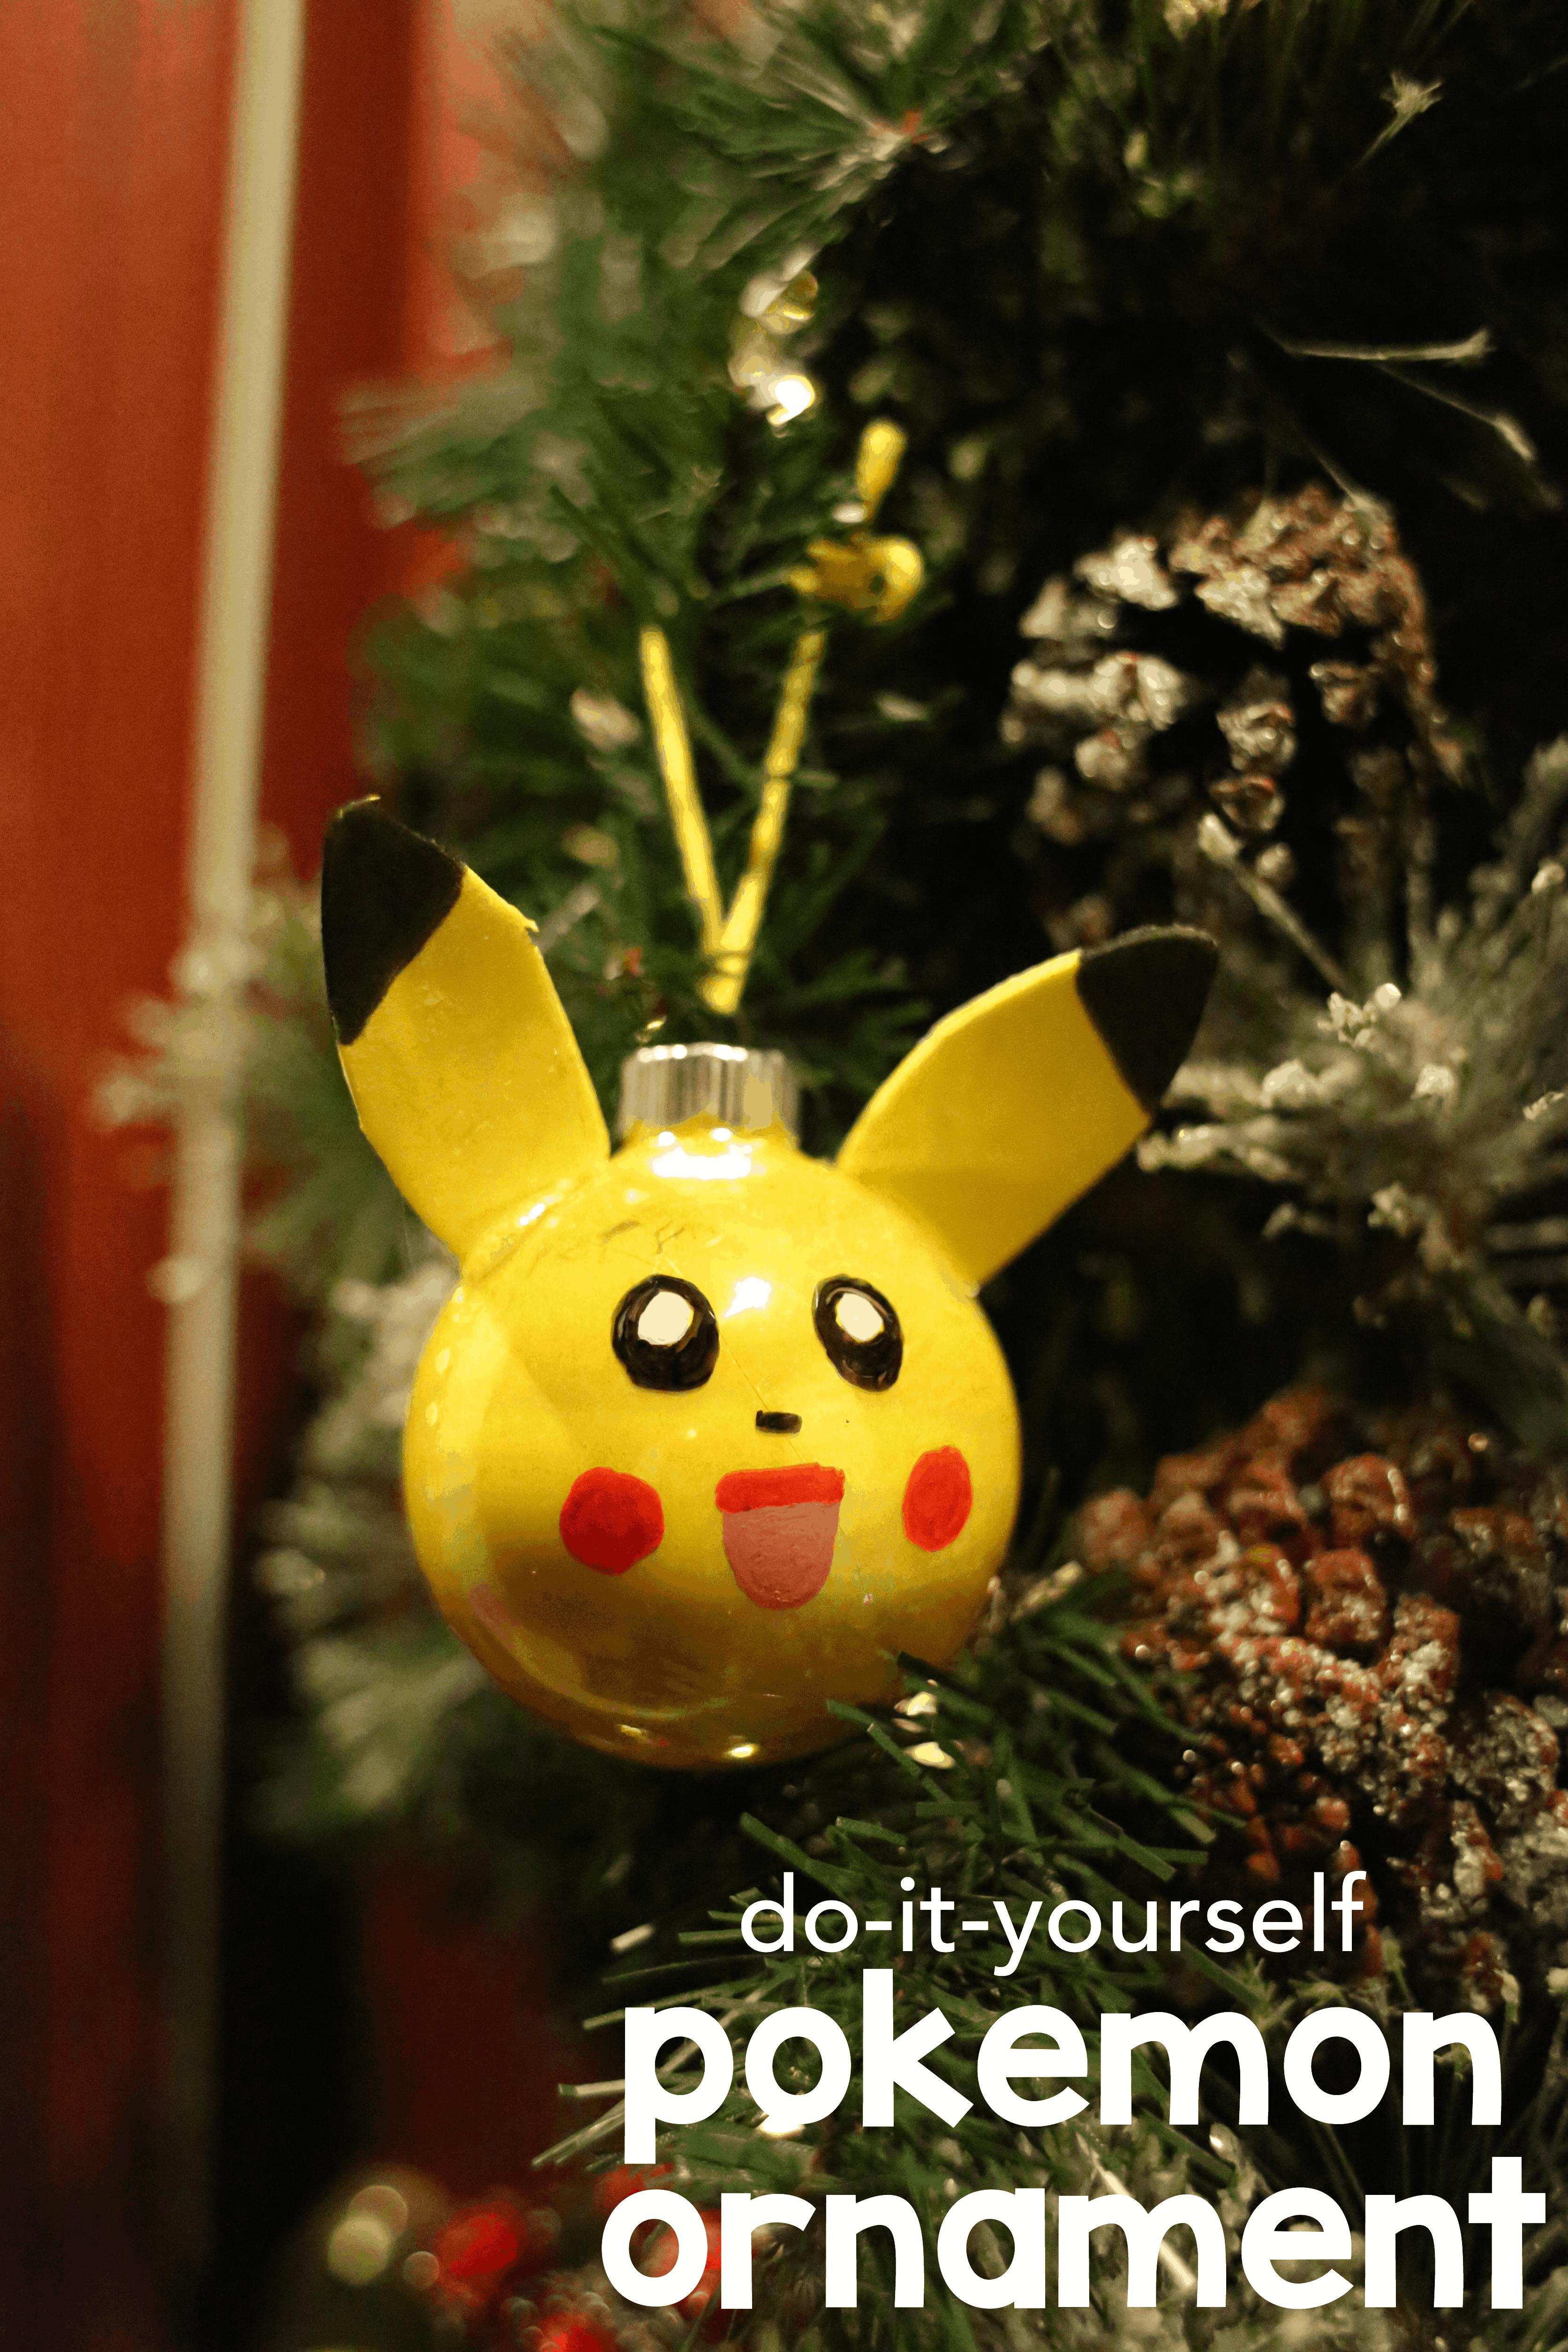 Diy pokemon ornament i can teach my child diy pokemon ornament solutioingenieria Choice Image